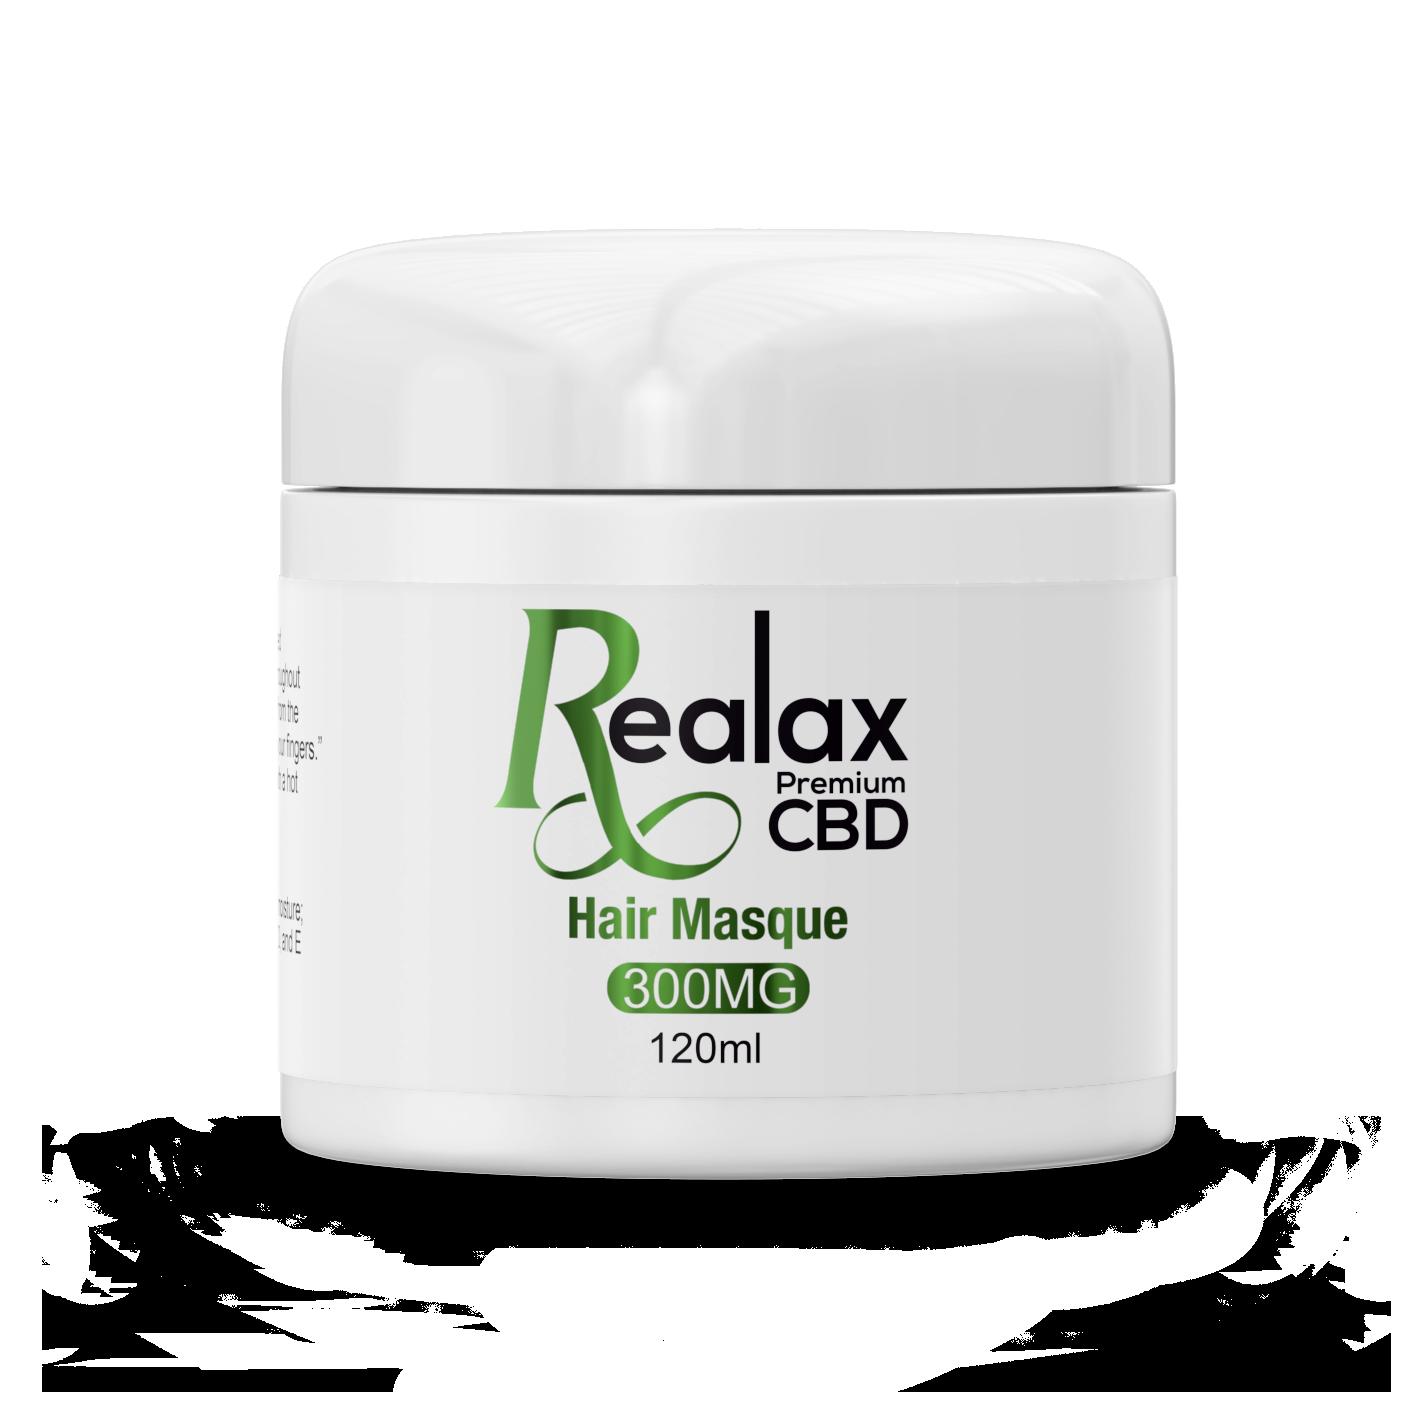 Realax CBD Hair Masque 300mg